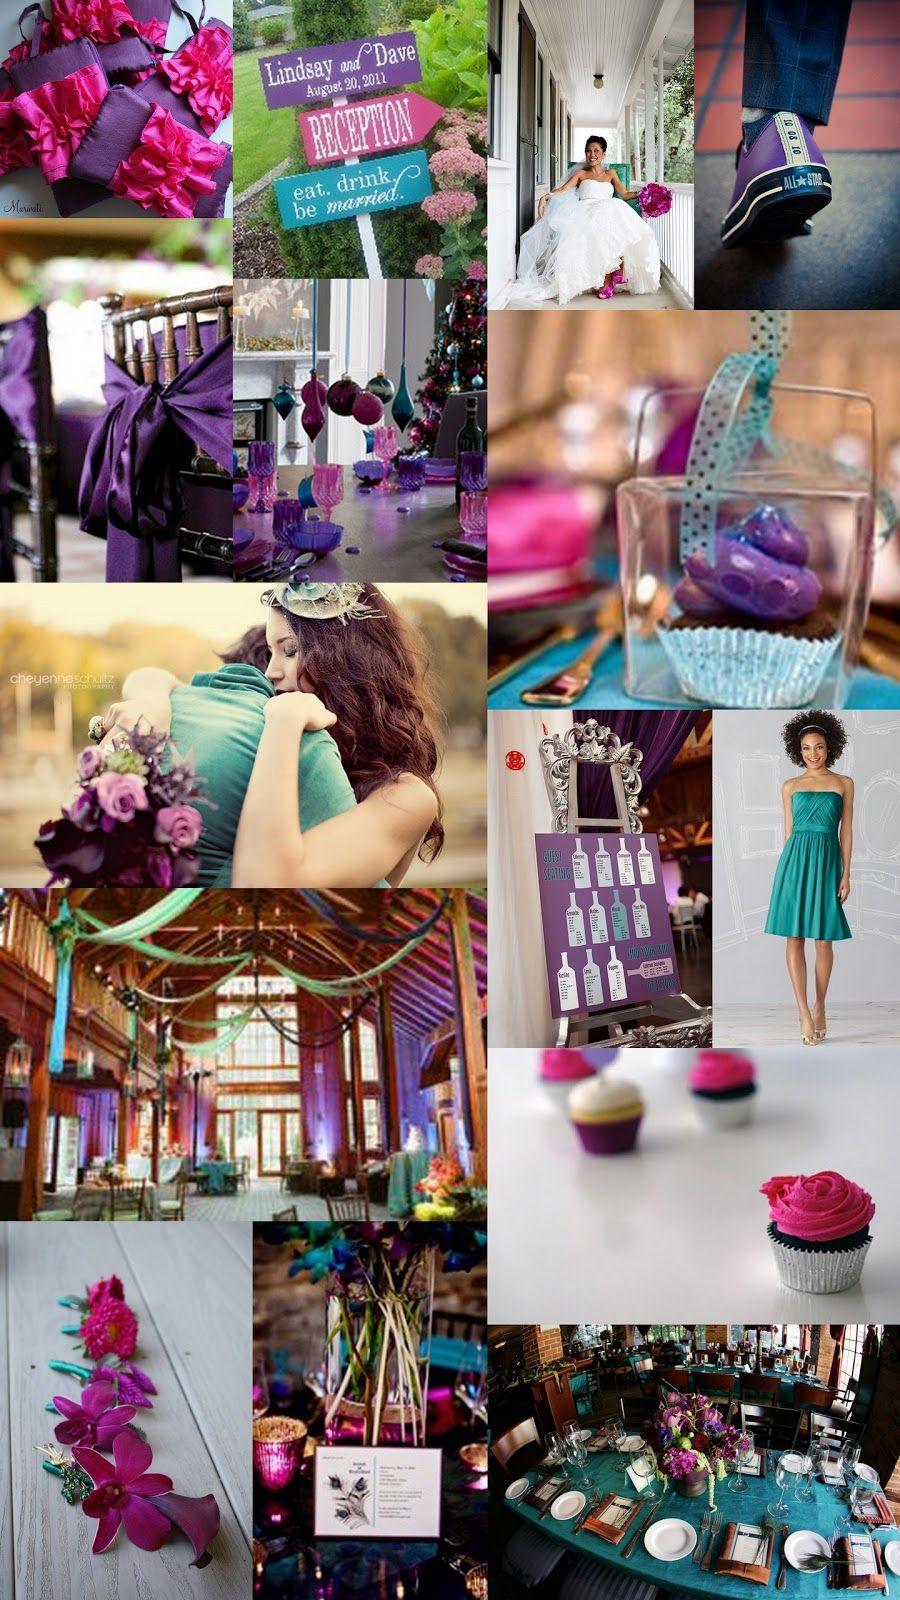 teal_magenta_fuschia_jewel_tone_Wedding_inspiration_board_valerie.jpg 900×1,600 pixels